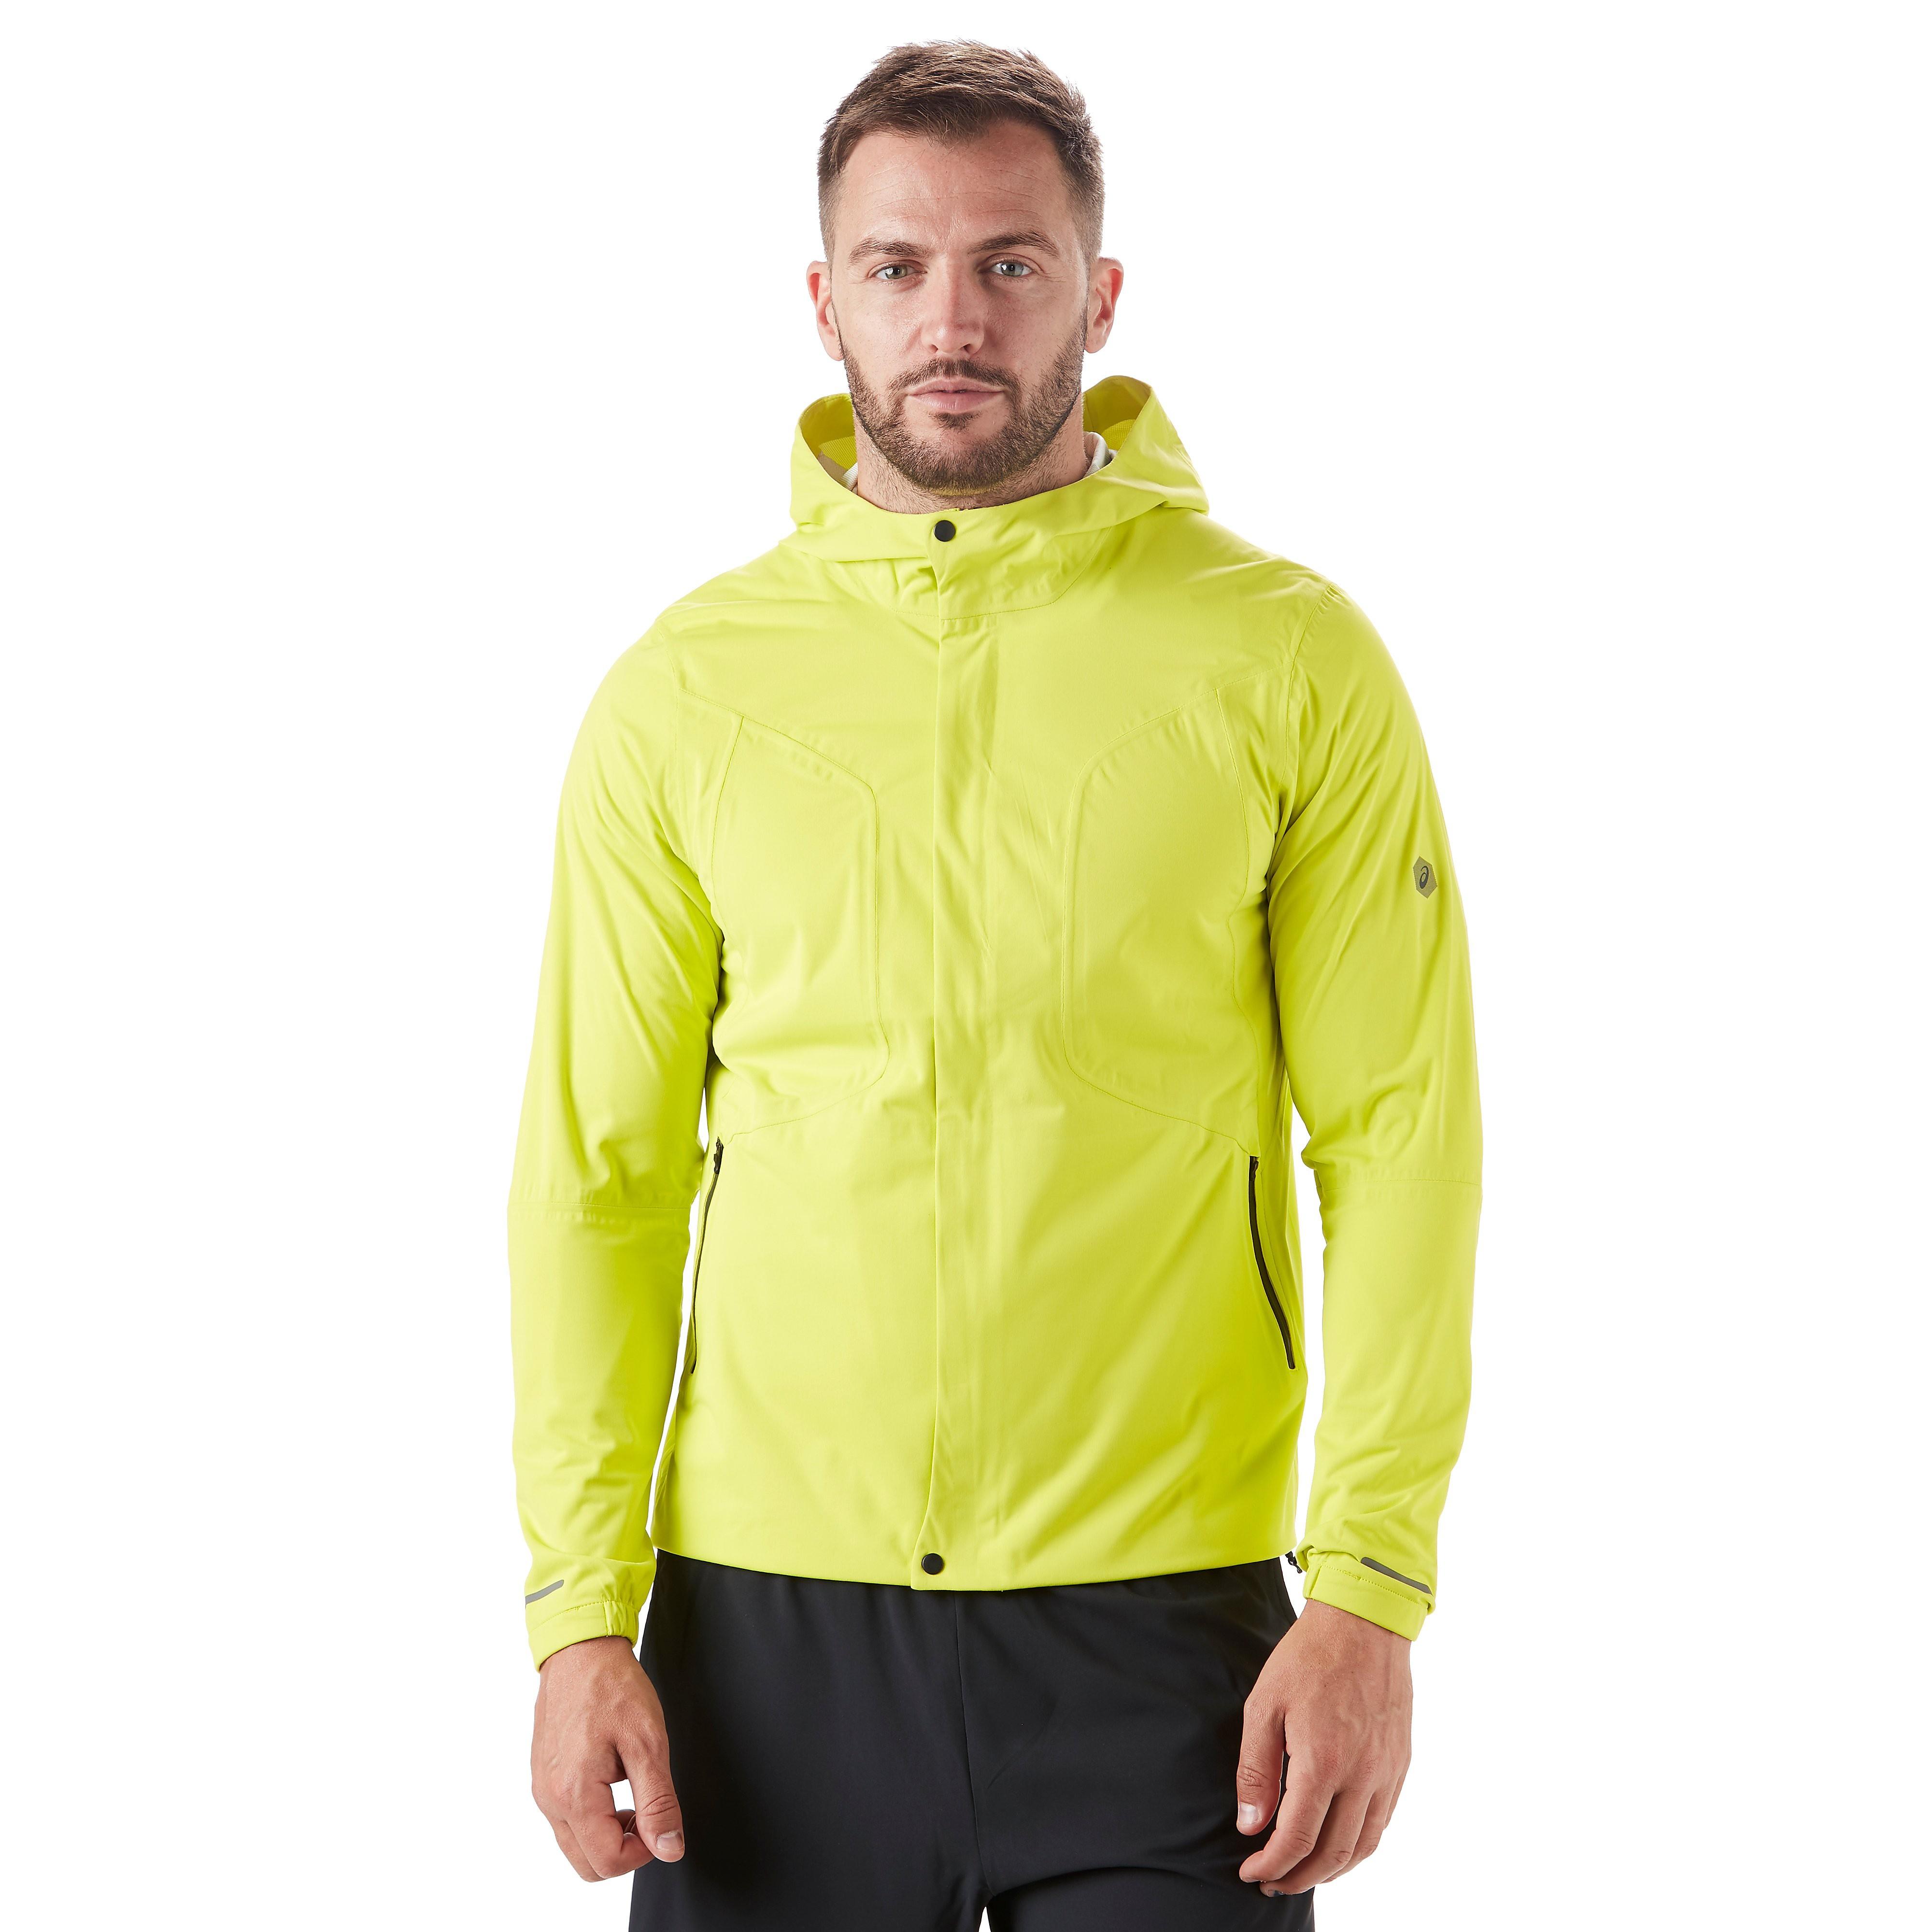 Men's ASICS Accelerate Running Jacket - Yellow, Yellow